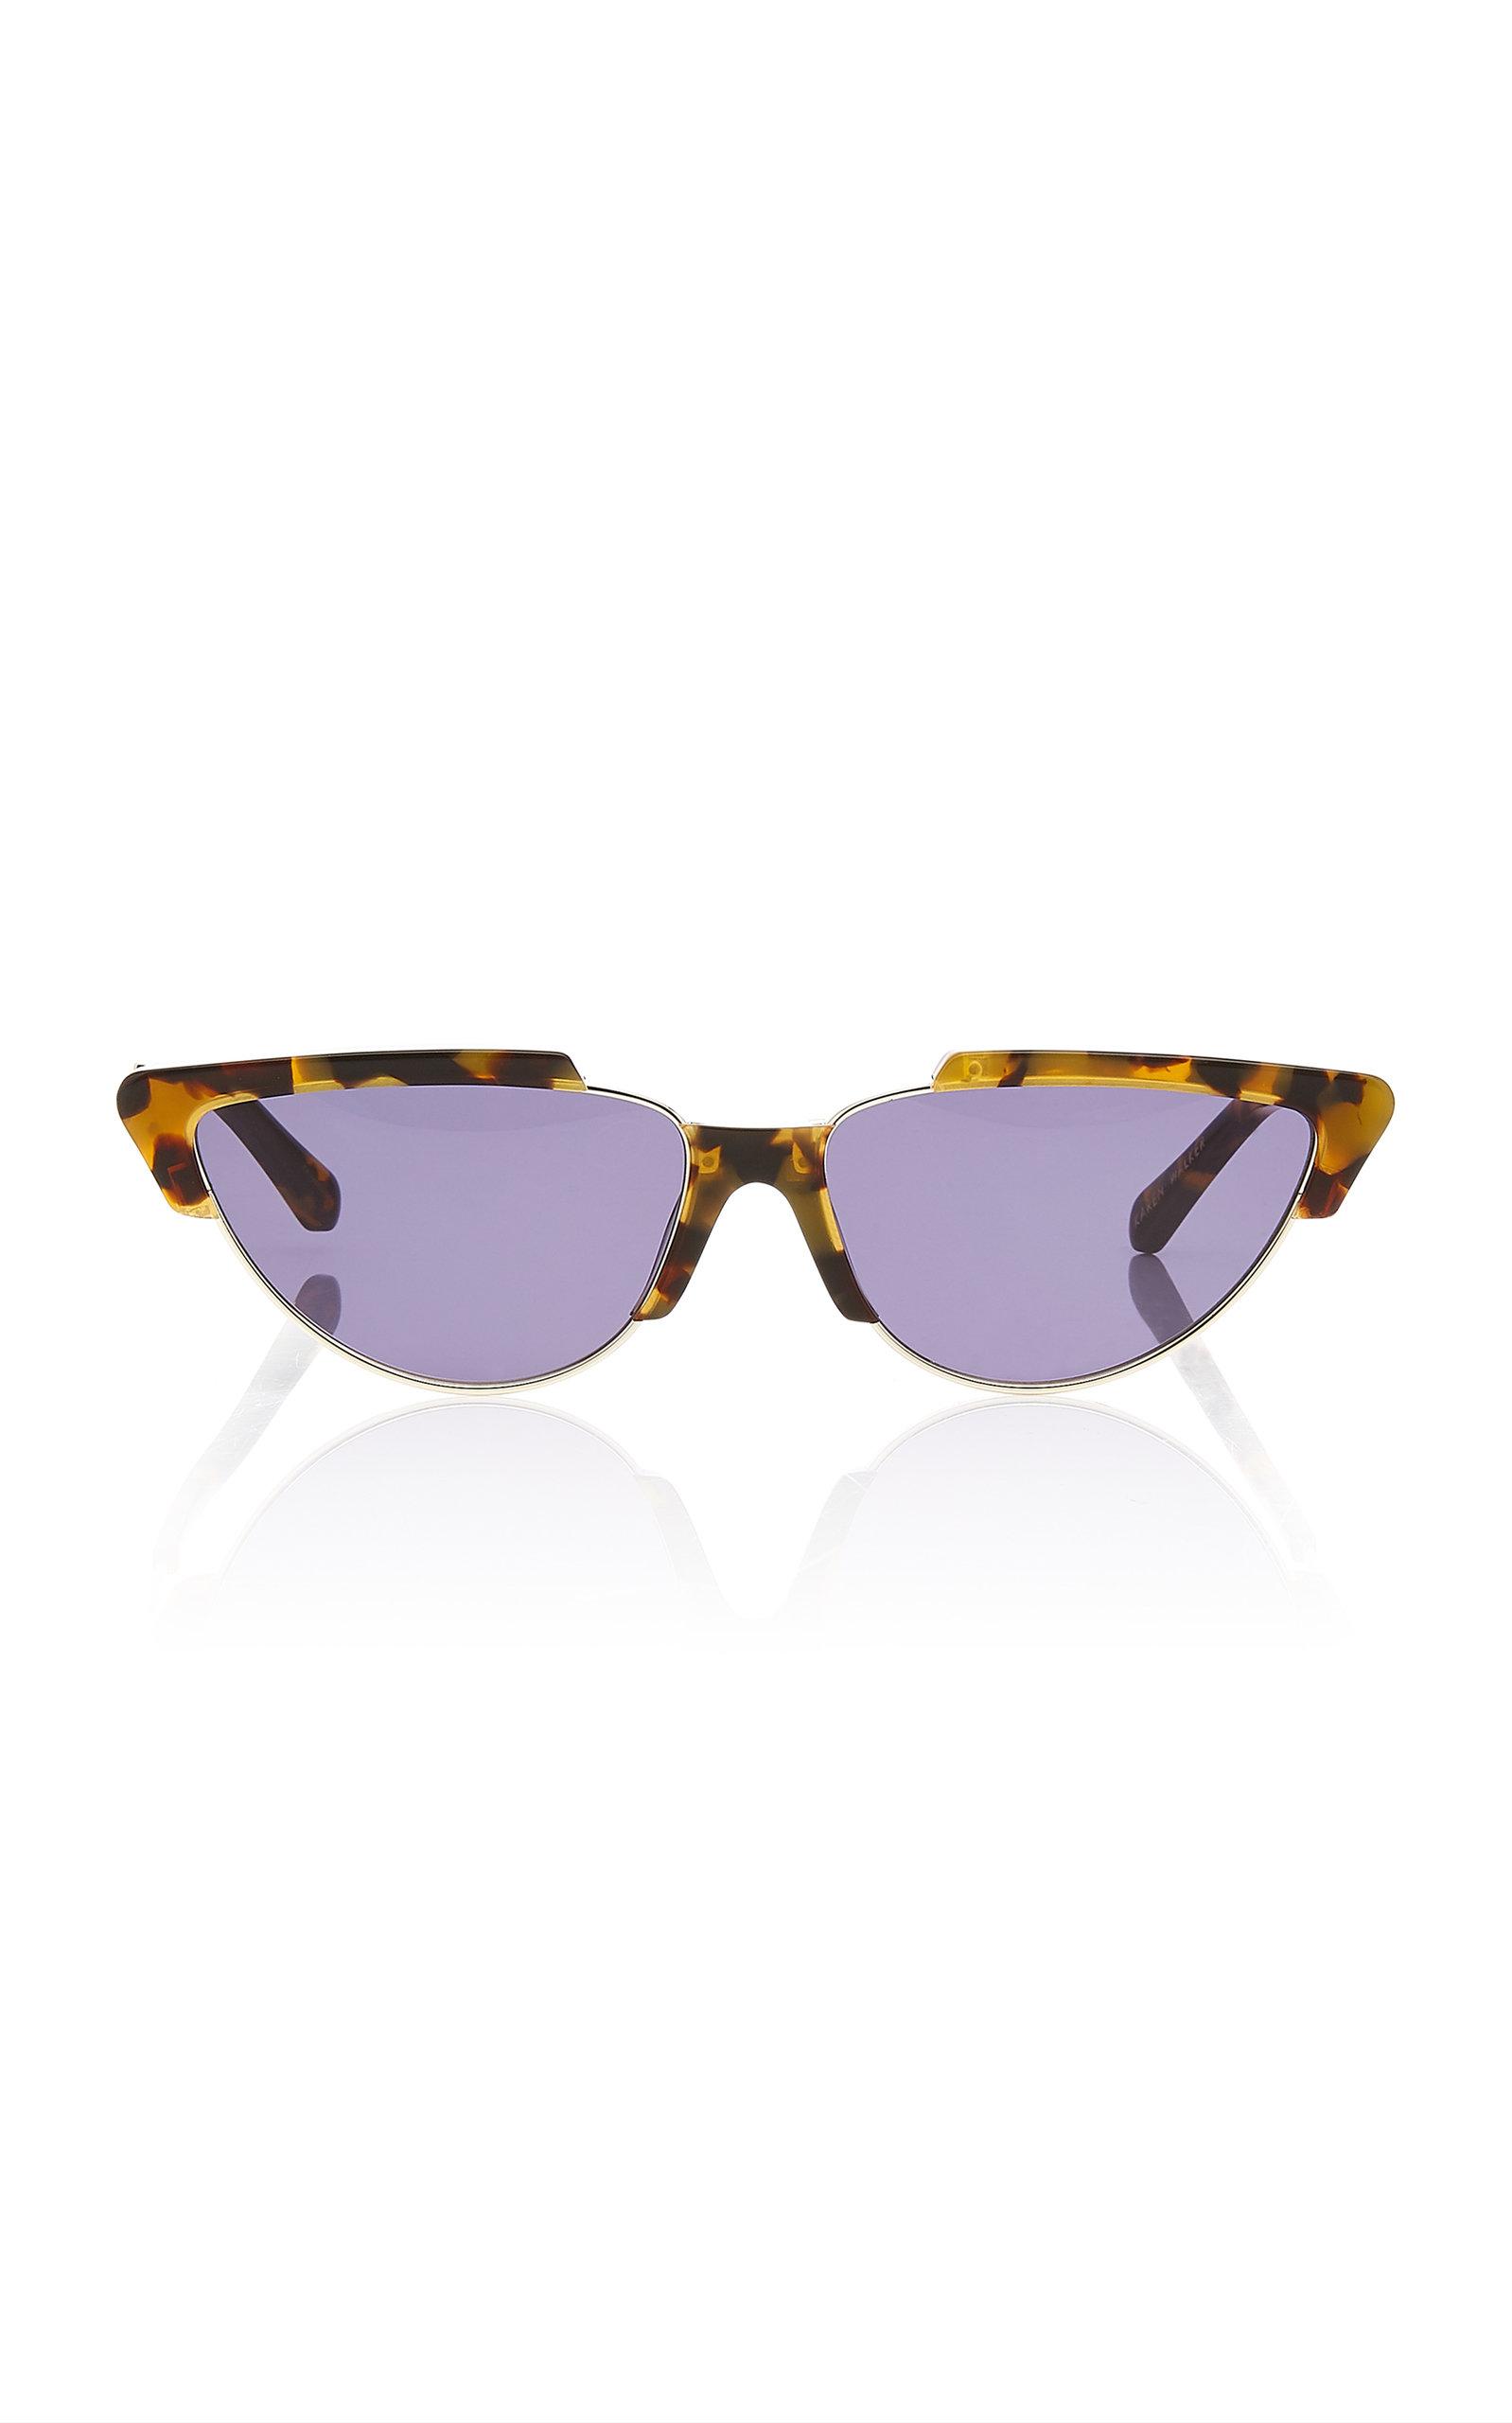 a9b35e02370d Tropics Cat Eye Acetate Sunglasses by Karen Walker | Moda Operandi